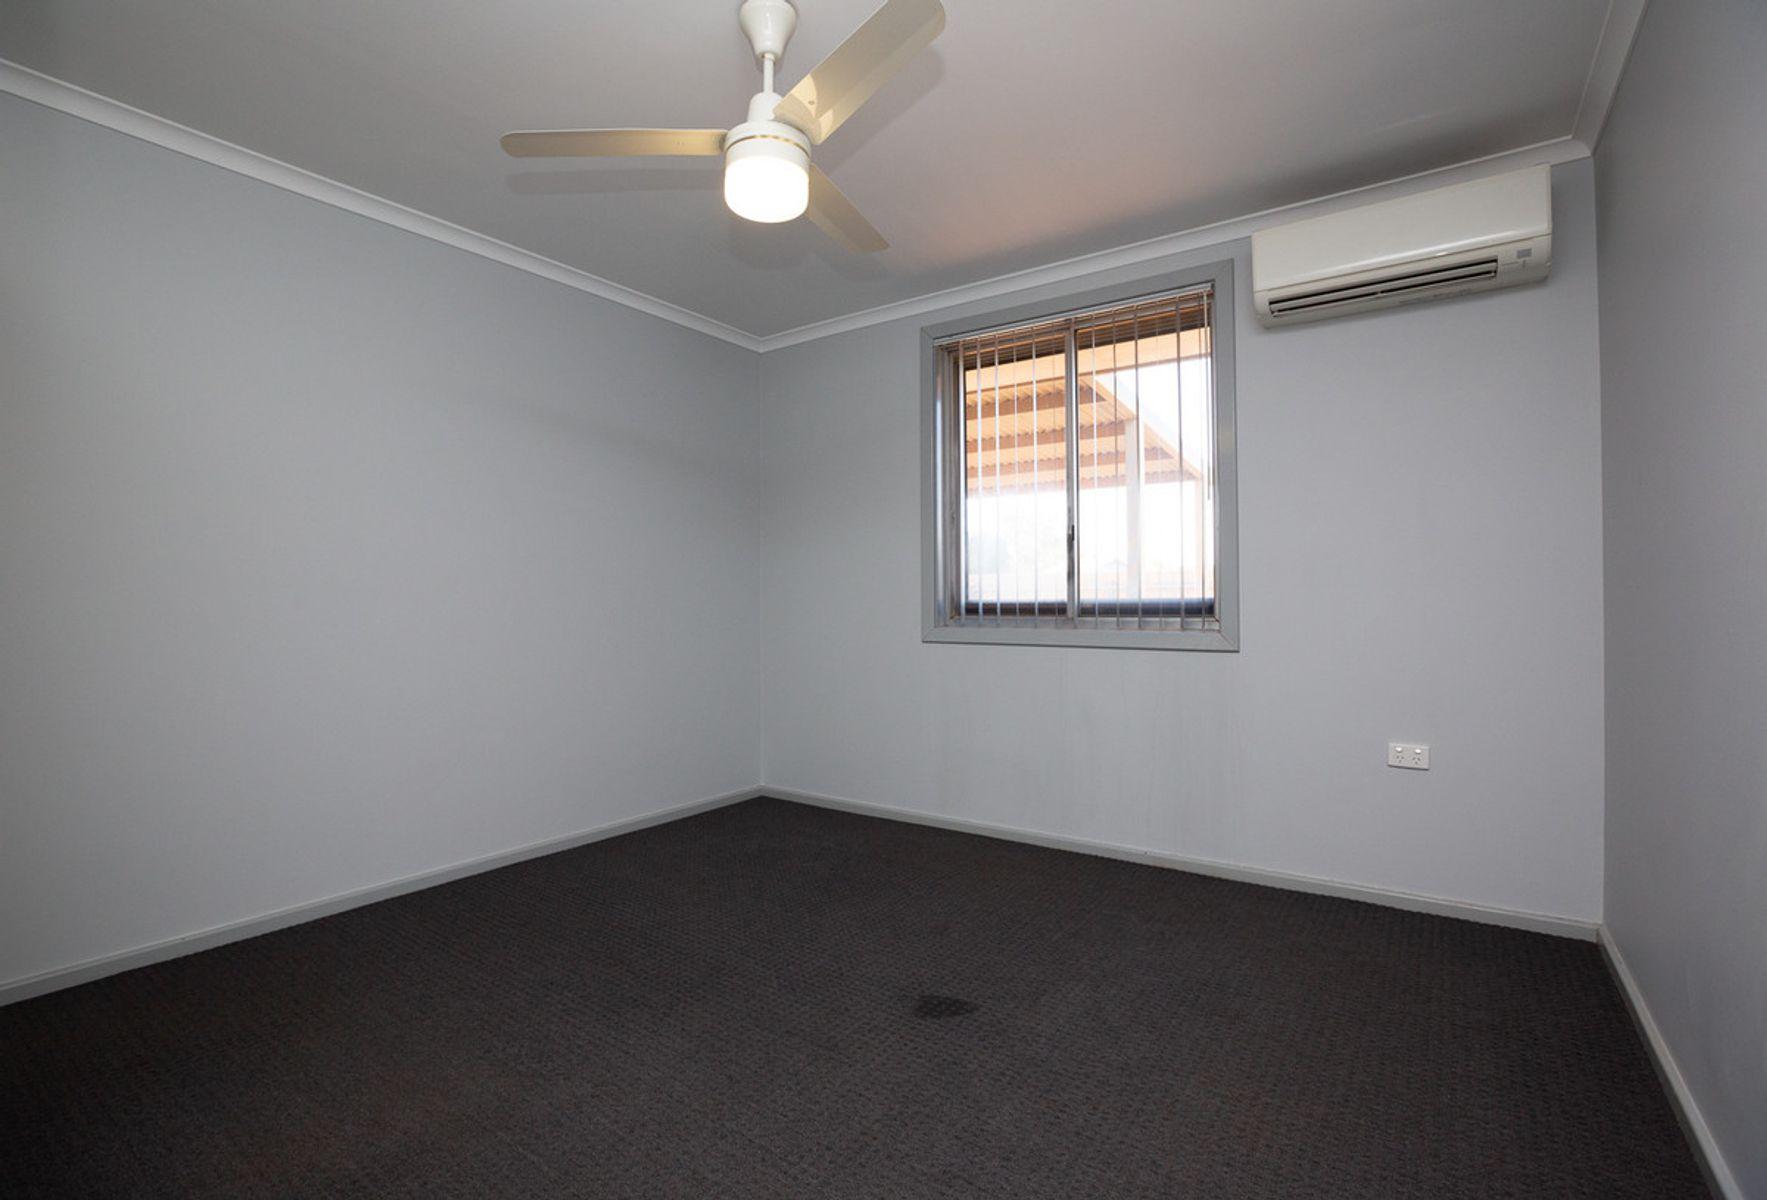 3/15 Becker Court, South Hedland, WA 6722